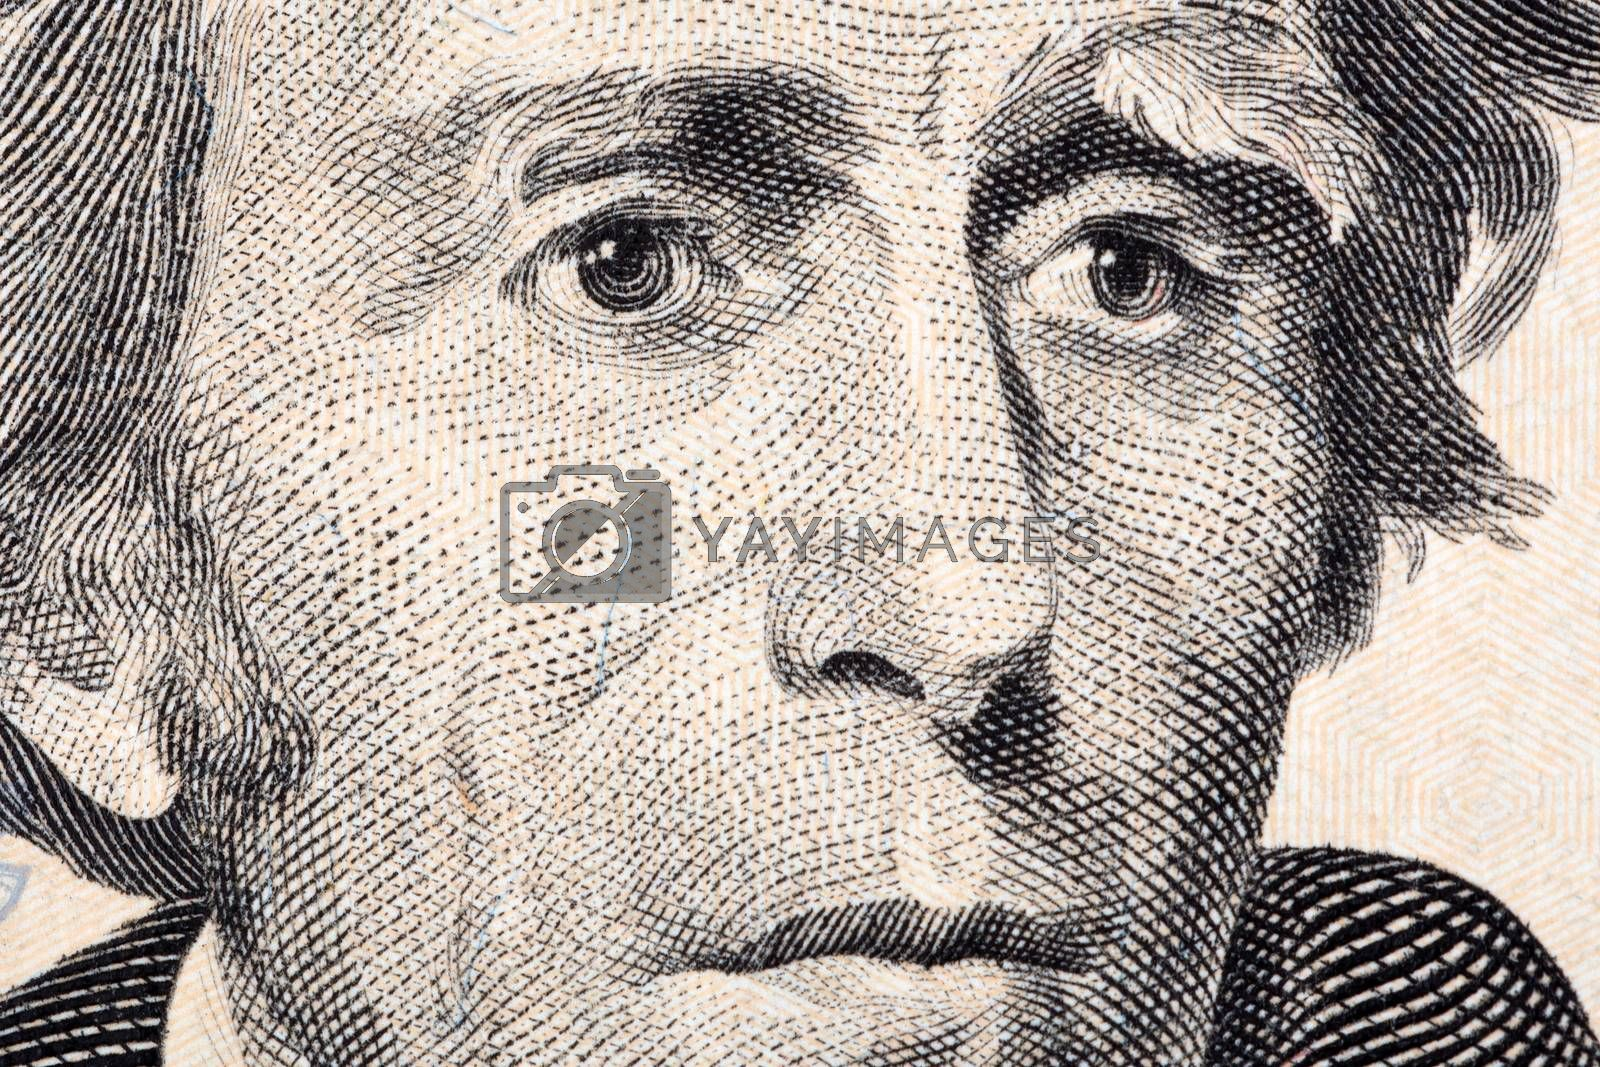 Andrew Jackson a close-up portrait on US twenty dollars